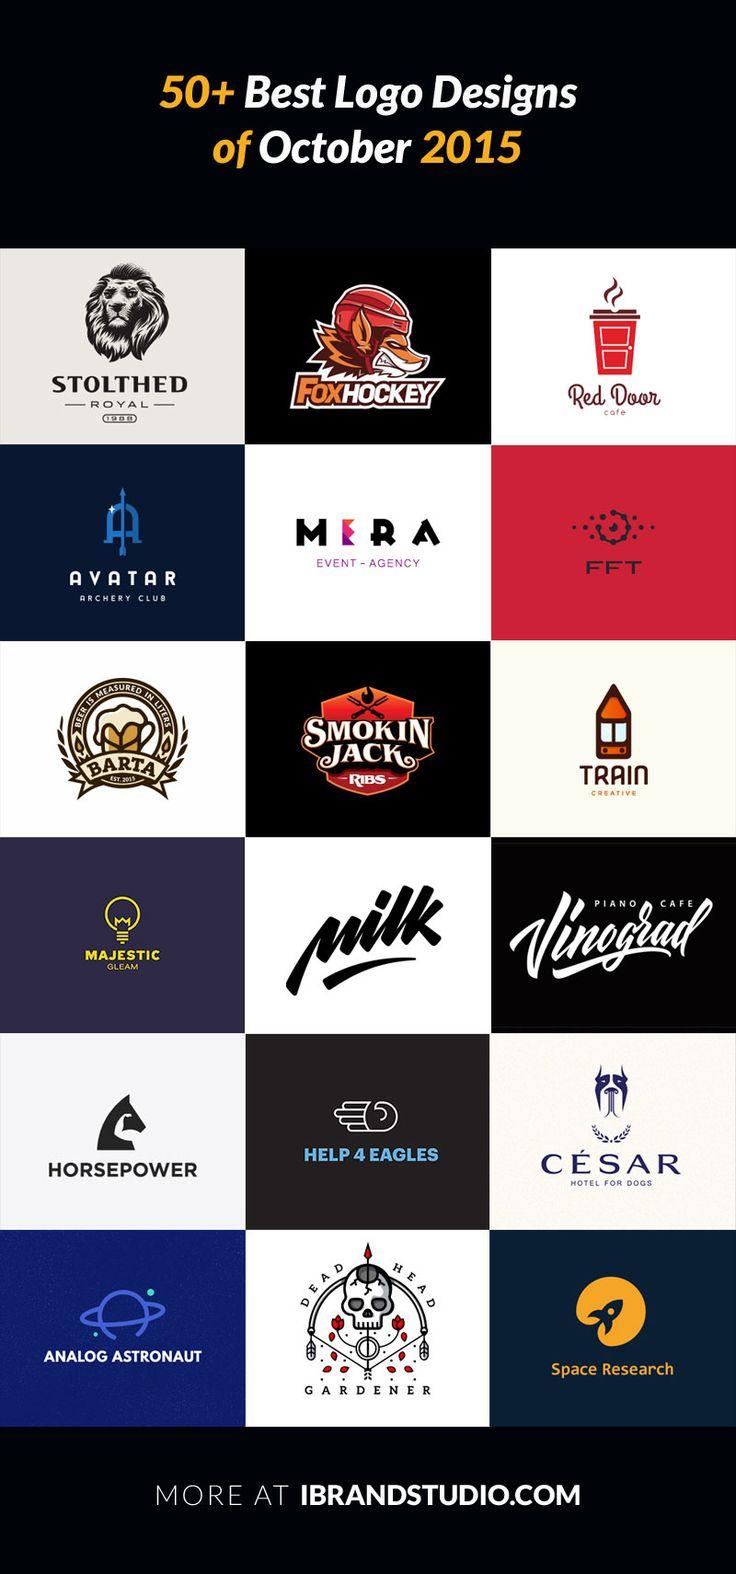 Logo Inspiration: 50+ Best Logo Designs of October 2015, here: http://ibrandstudio.com/inspiration/best-logo-designs-october-2015